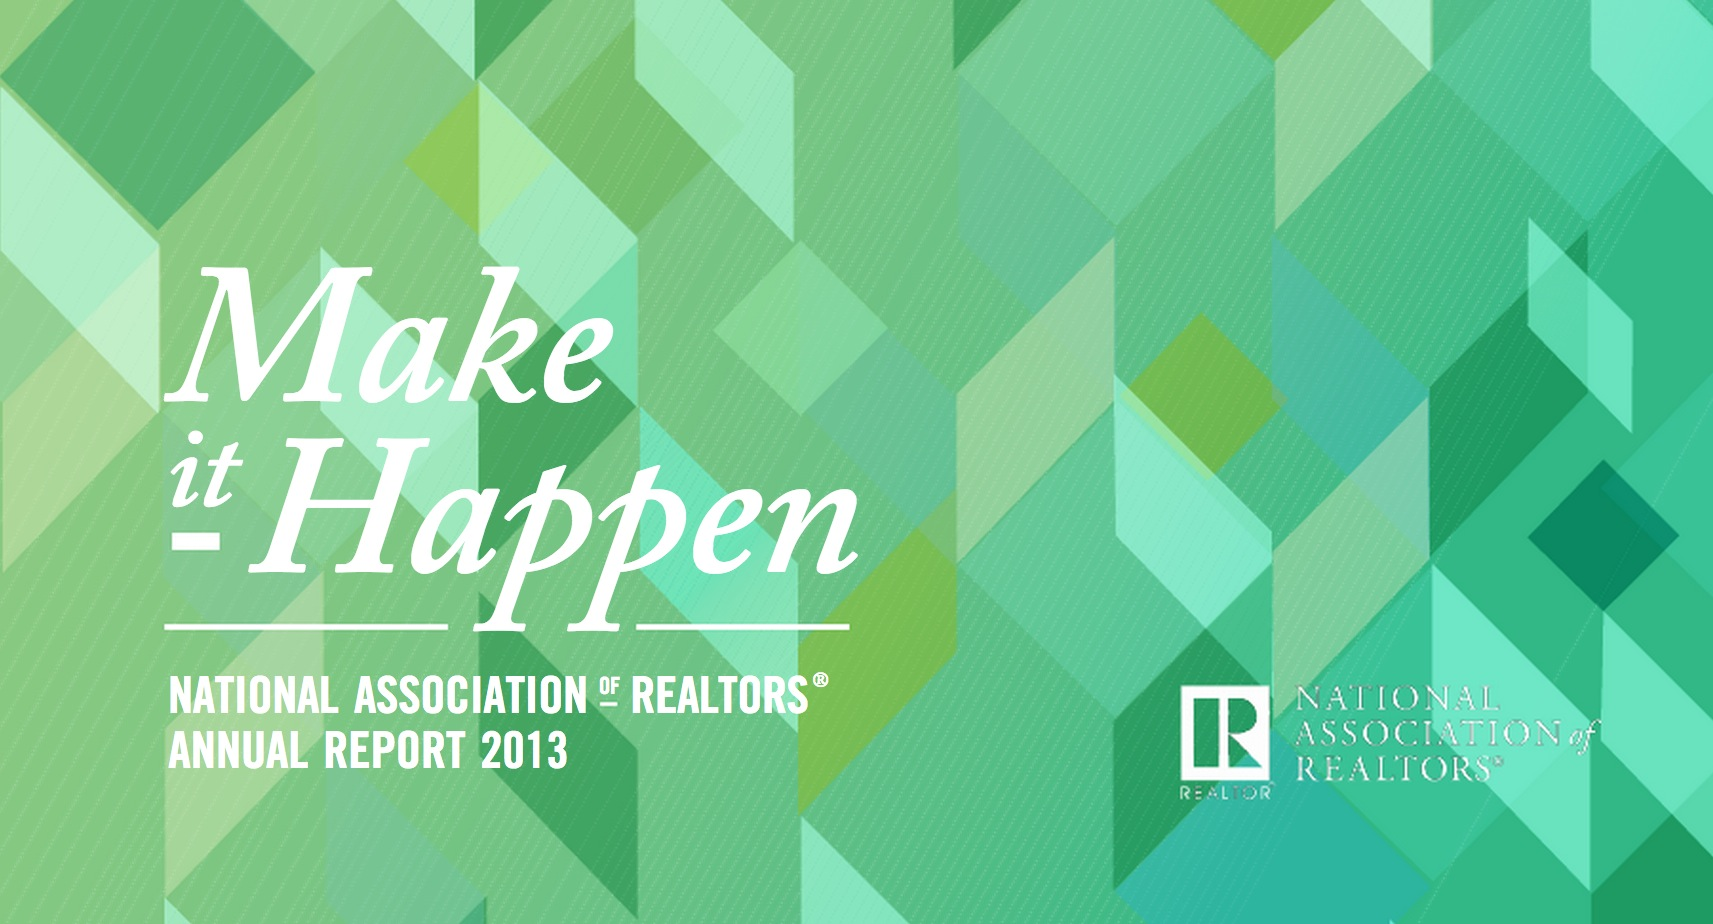 National Association of Realtors 2013 Annual Report